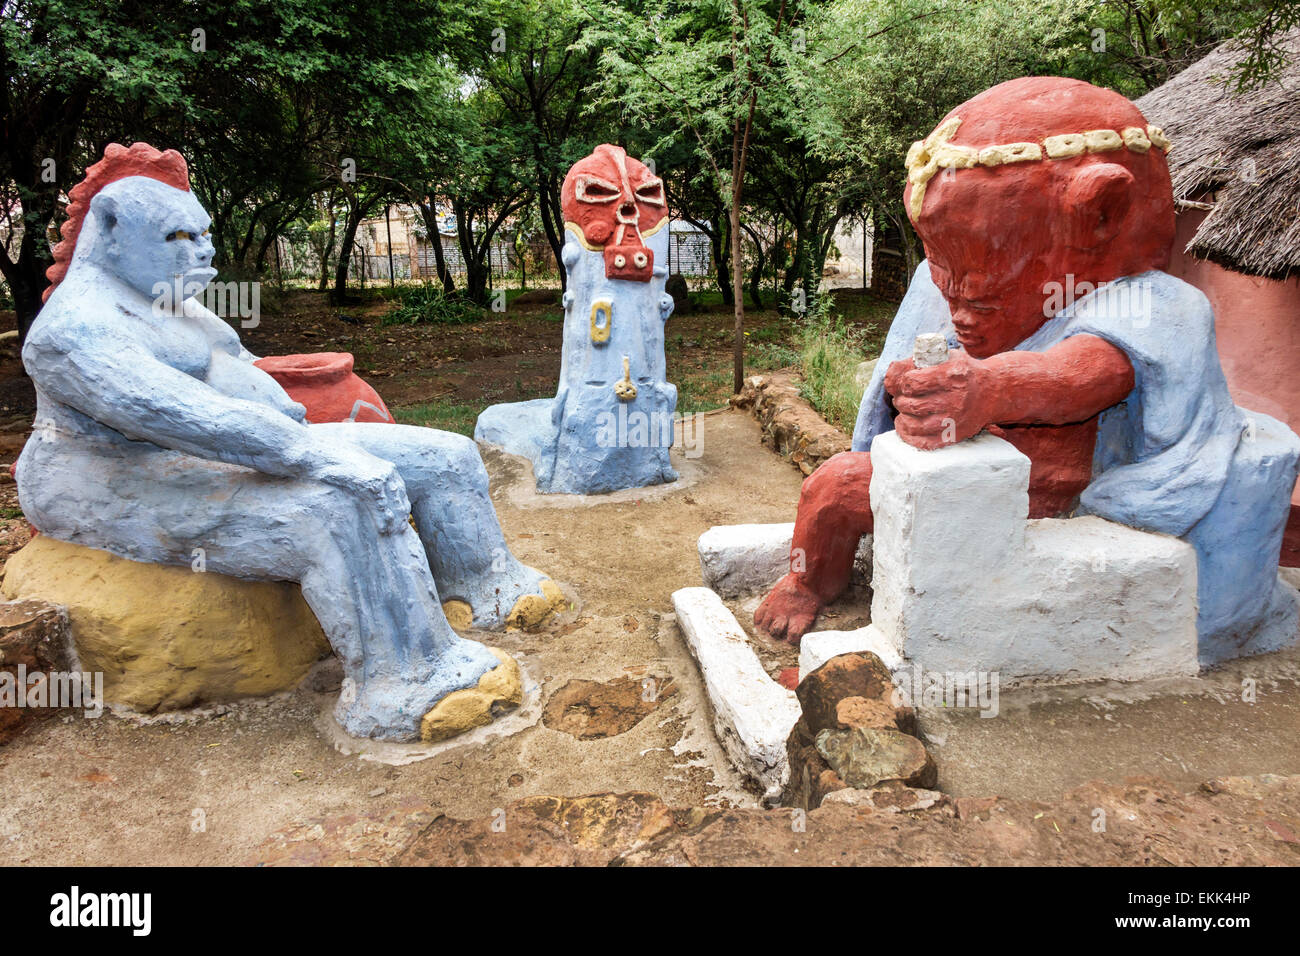 South Africa, African, Johannesburg, Soweto, Kwa-Khaya Lendaba Credo Mutwa Cultural Village, sculptures, sightseeing Stock Photo